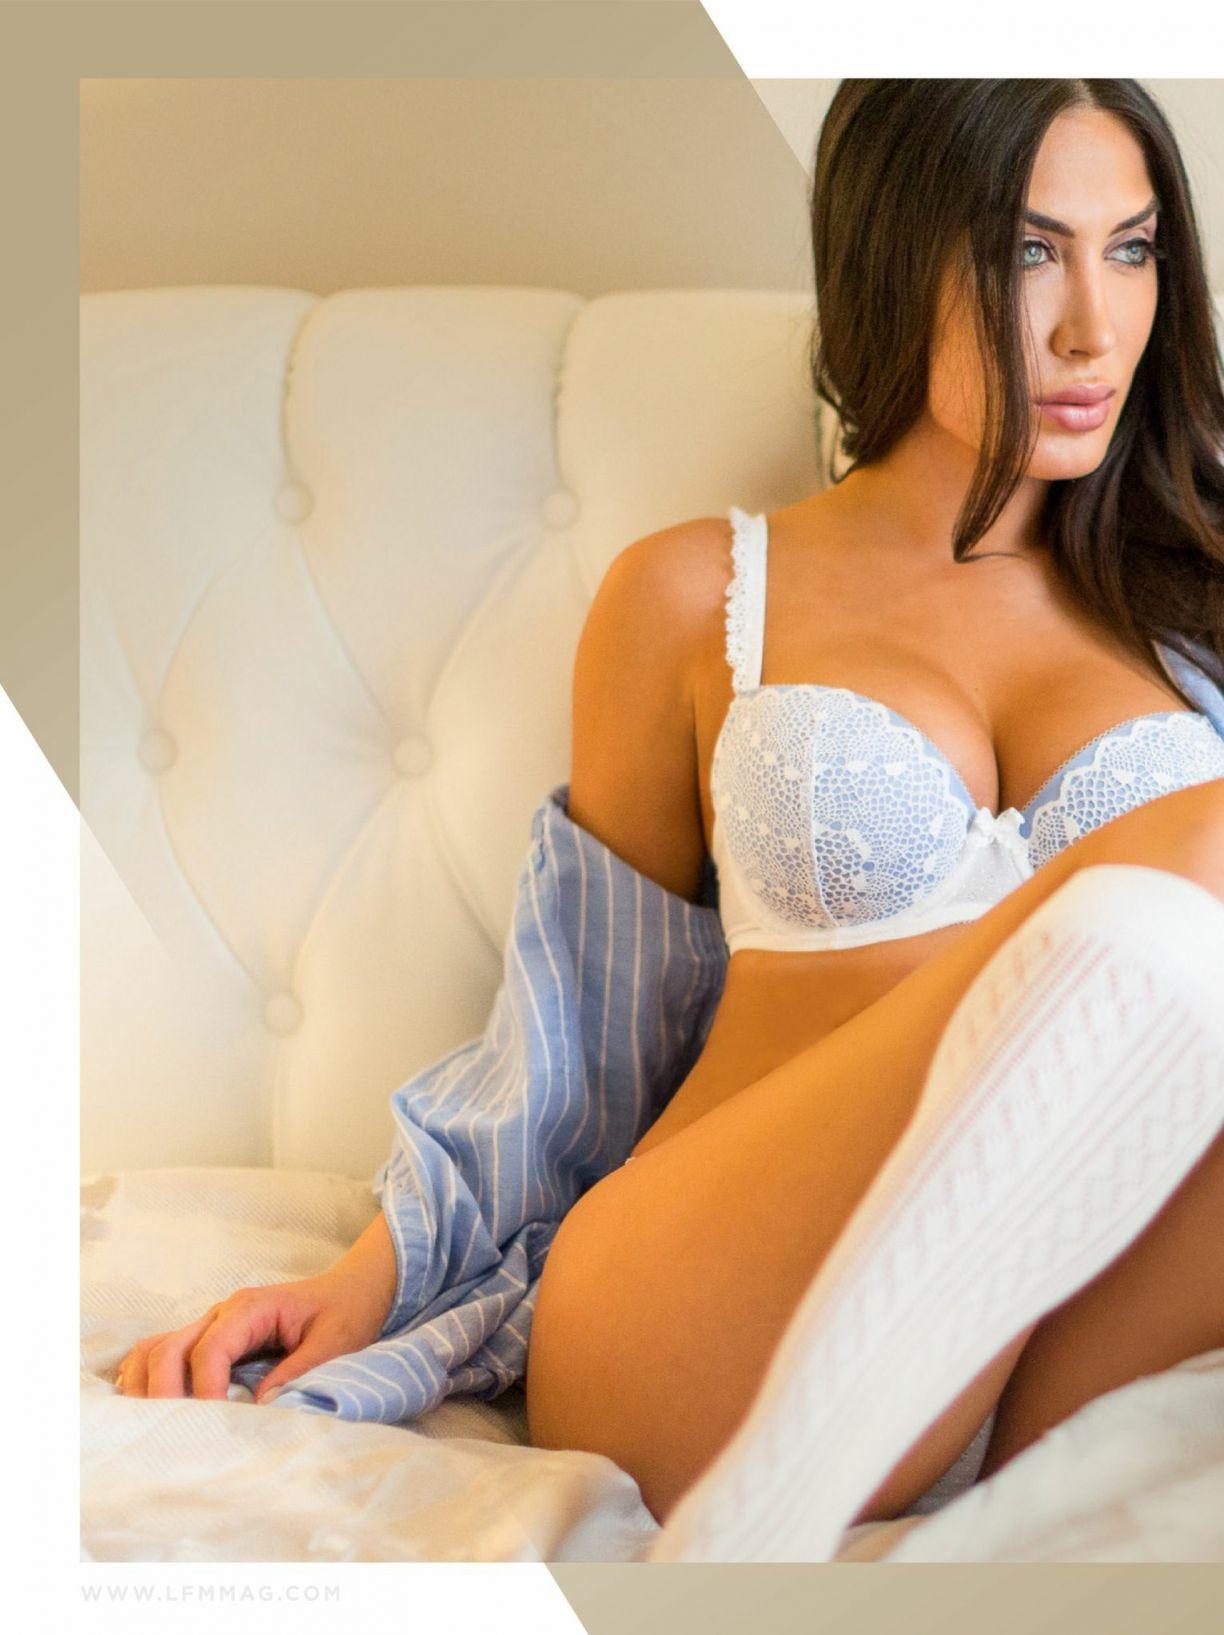 Boobs Victoria Sophia nude photos 2019